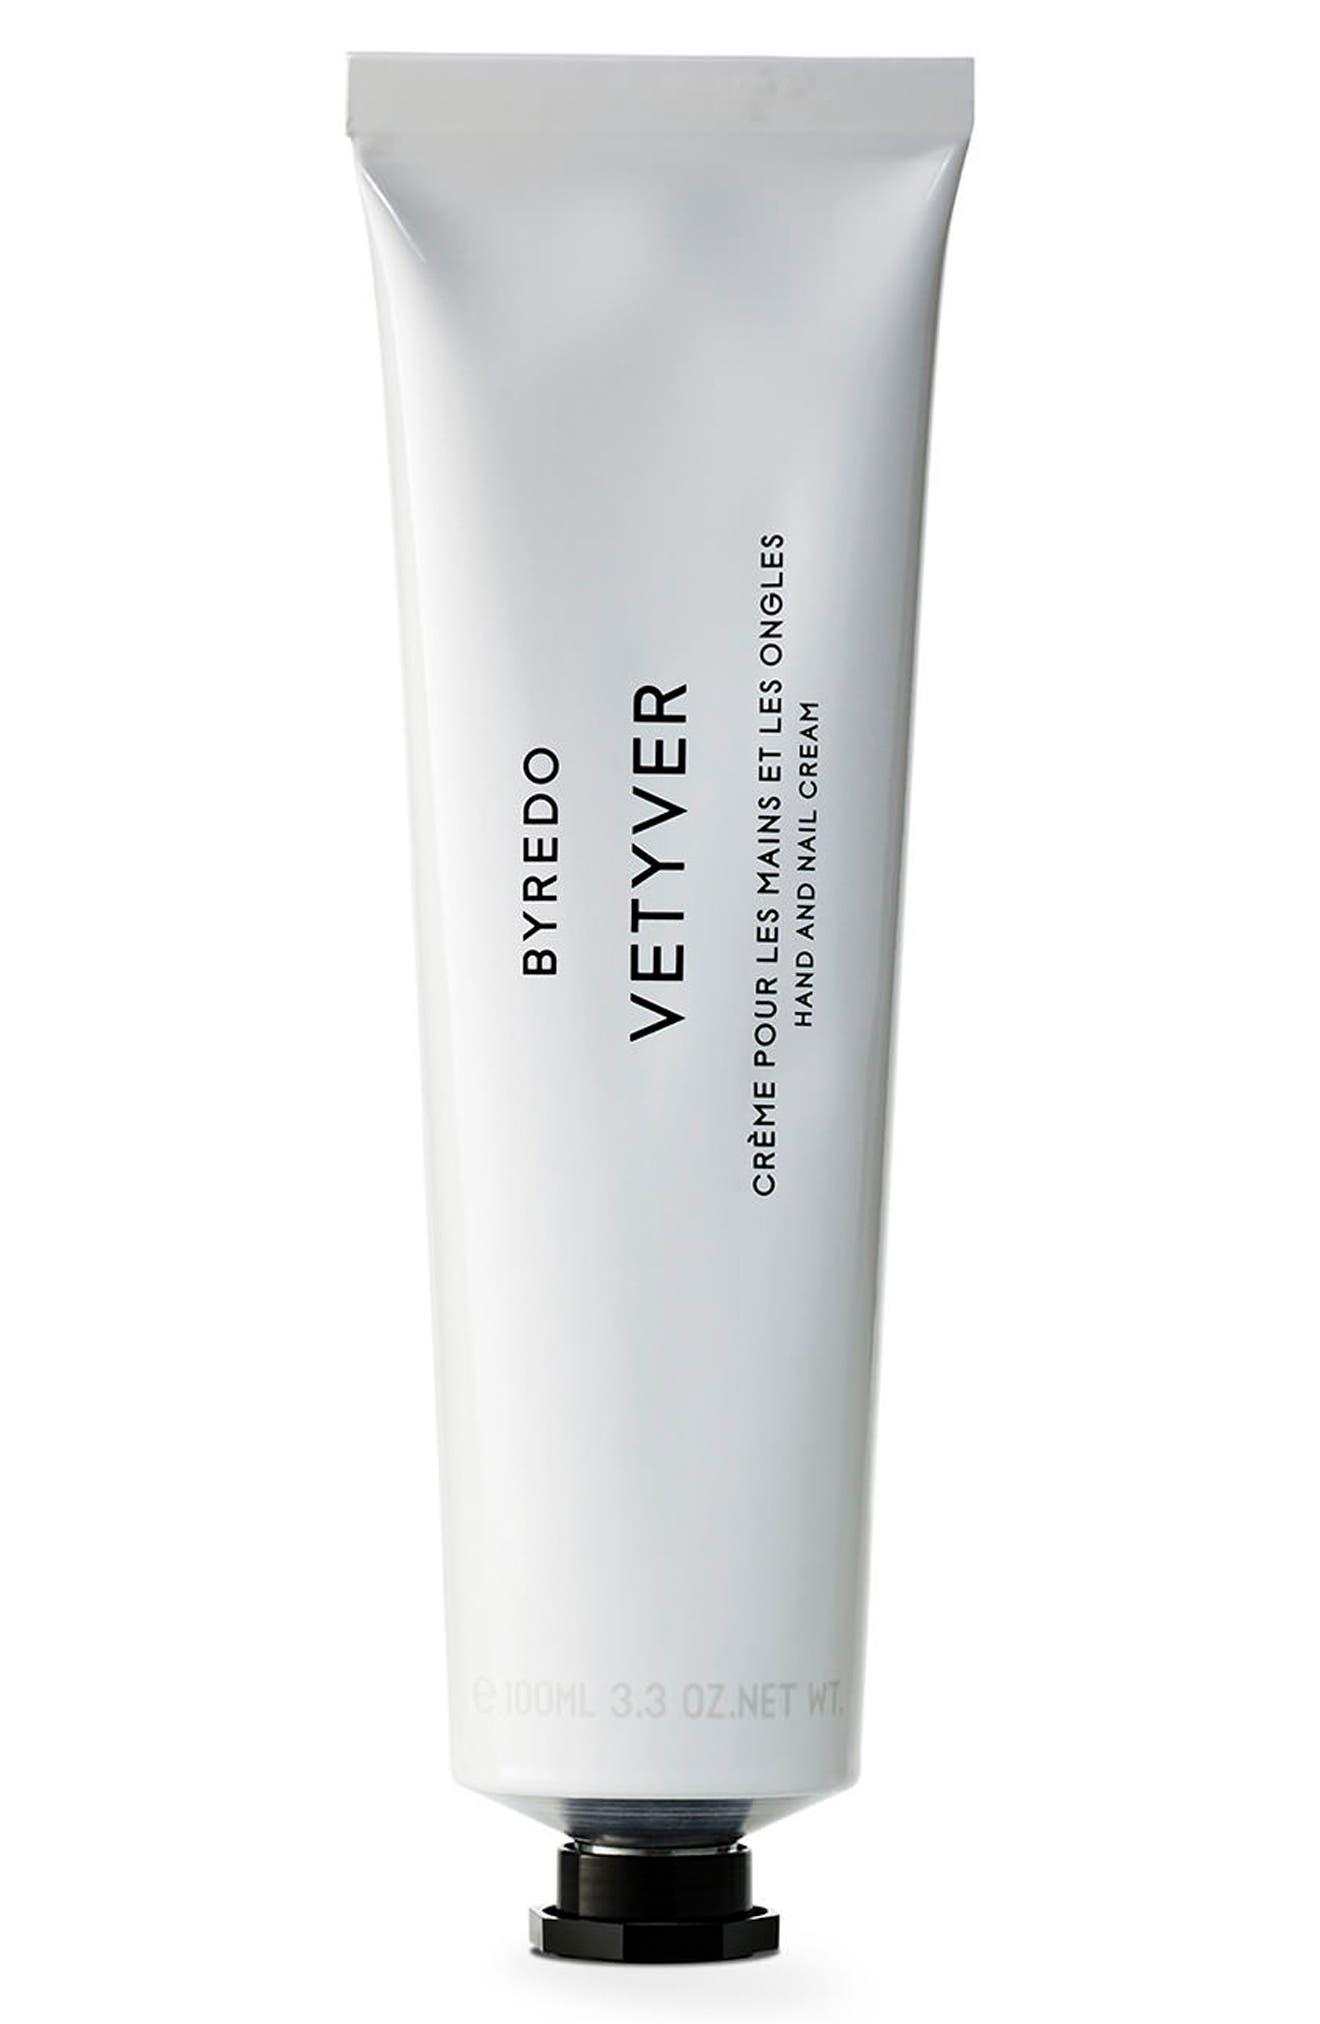 Vetyver Hand Cream,                             Main thumbnail 1, color,                             NO COLOR